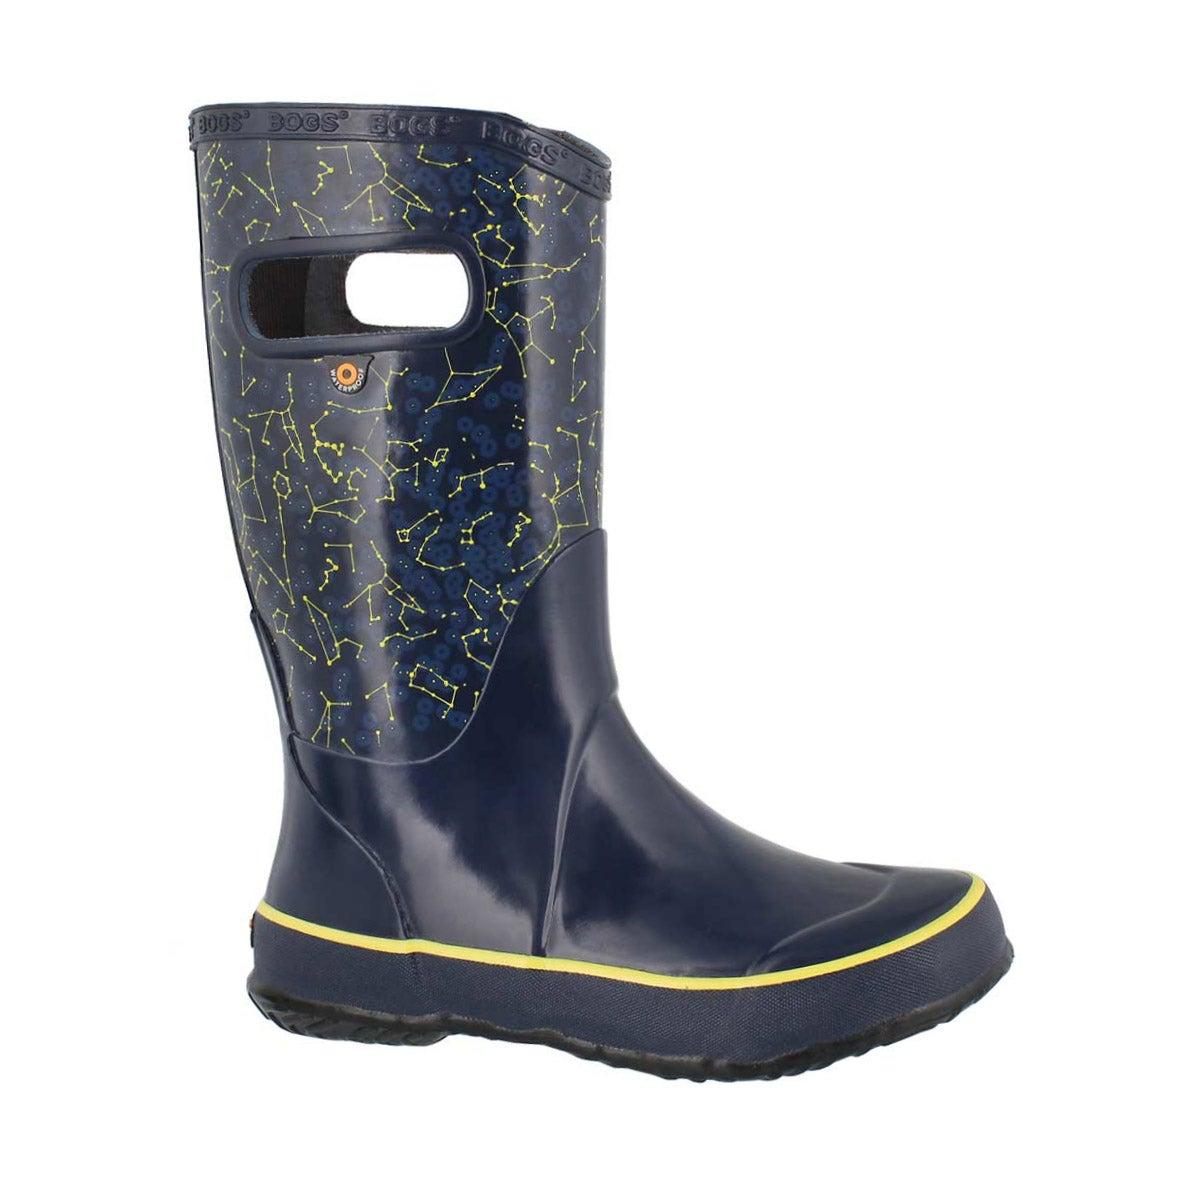 Kids' CONSTELLATIONS blue multi rain boots